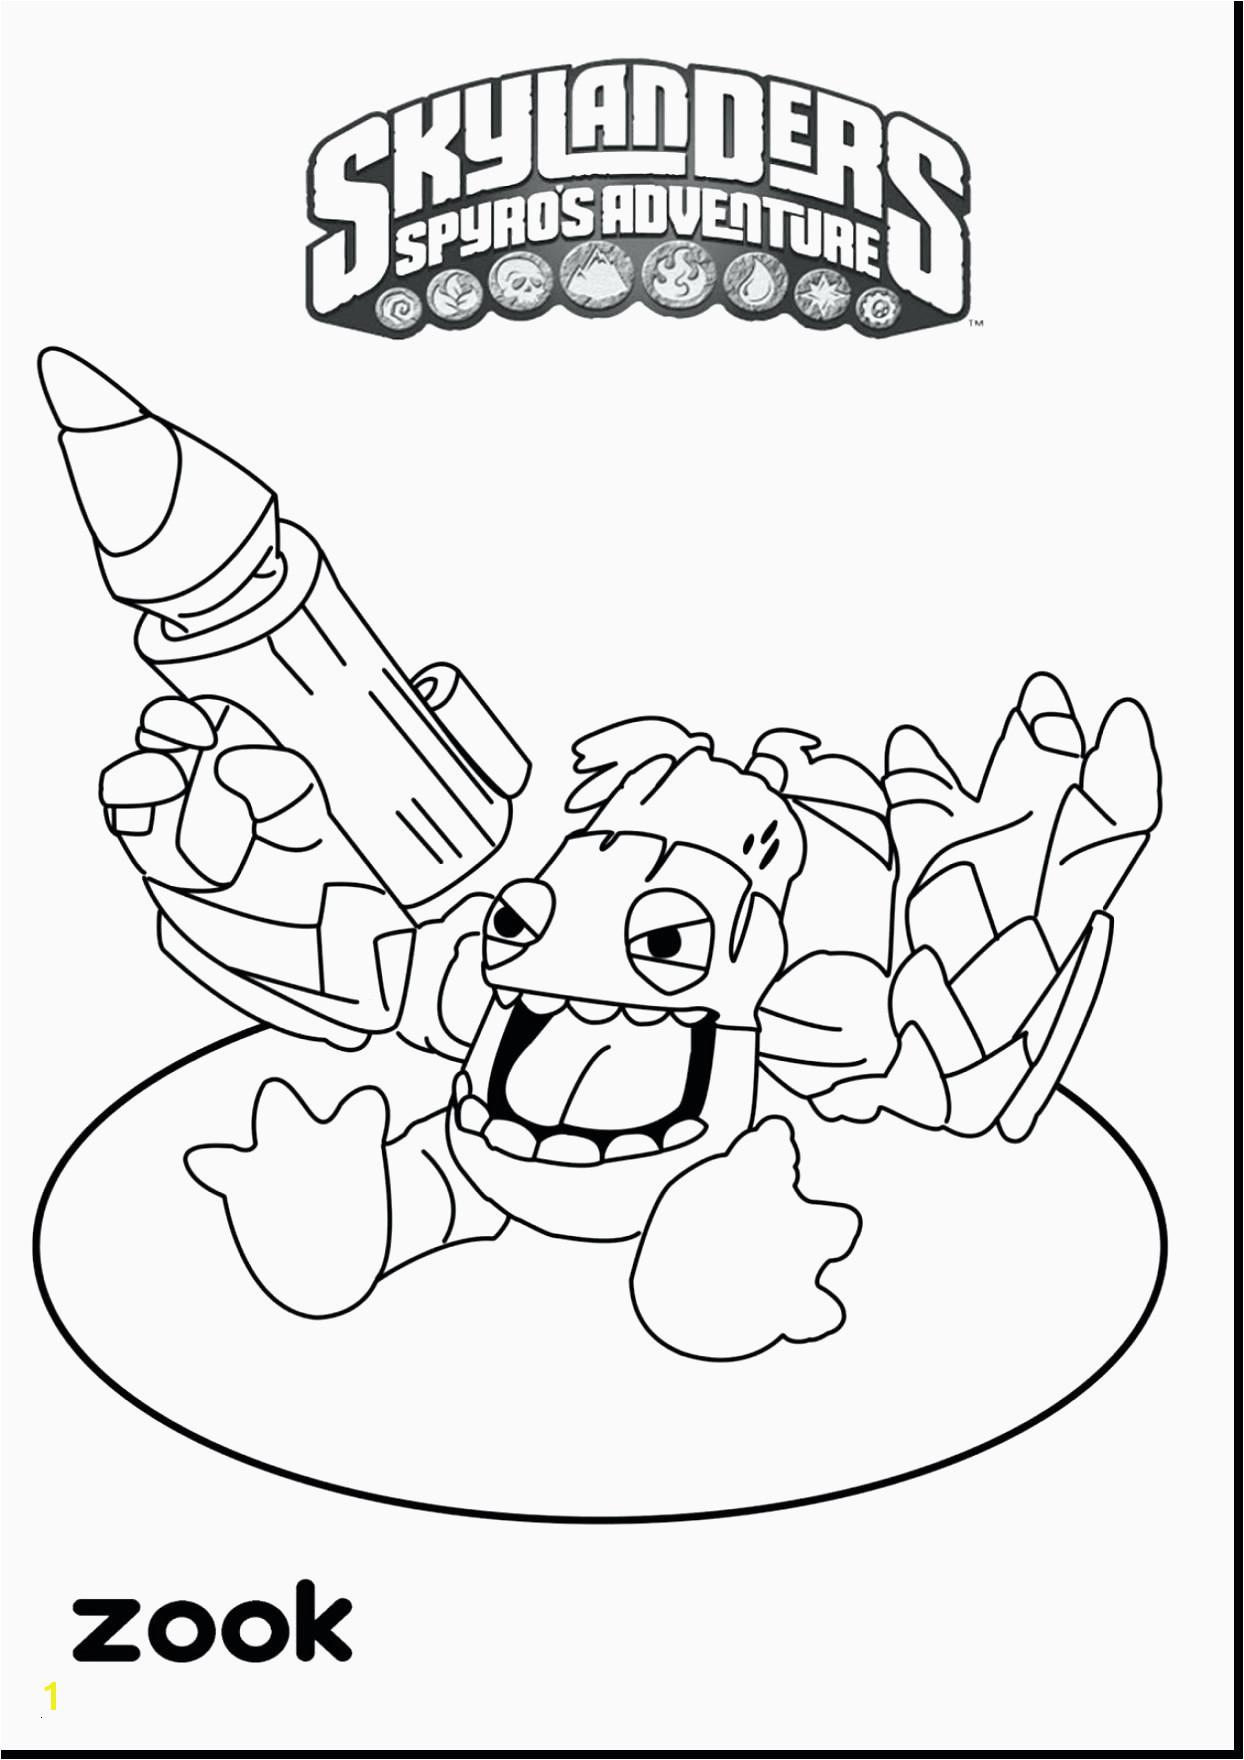 Spongebob Squarepants House Coloring Pages Fresh Color Sheets for Adults Coloring Pages Neu Ausmalbilder